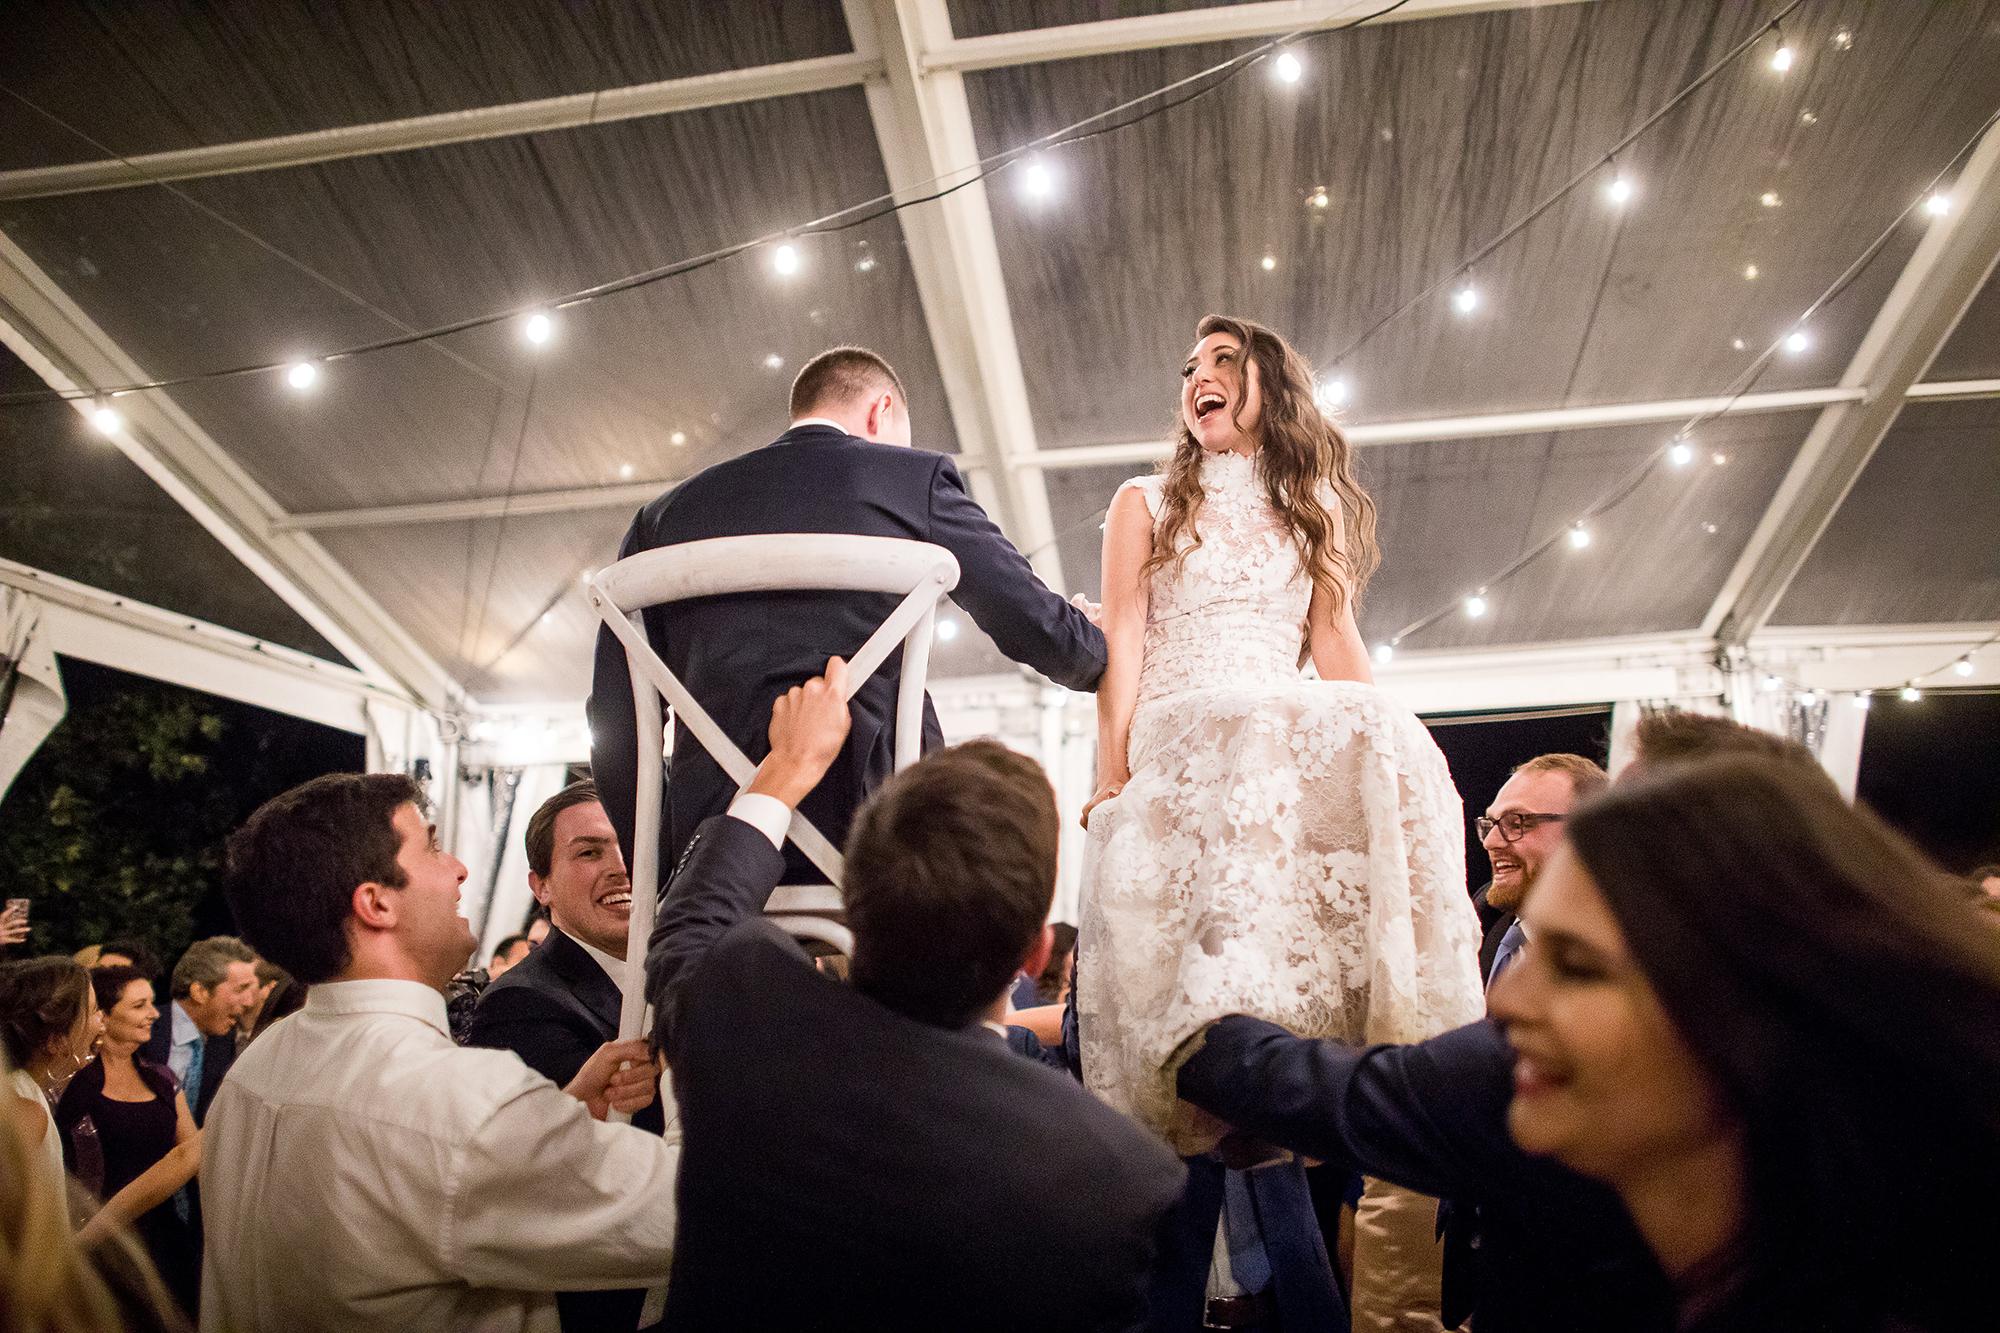 013_Garden Wedding Dance Party_AE Events.jpeg.jpg